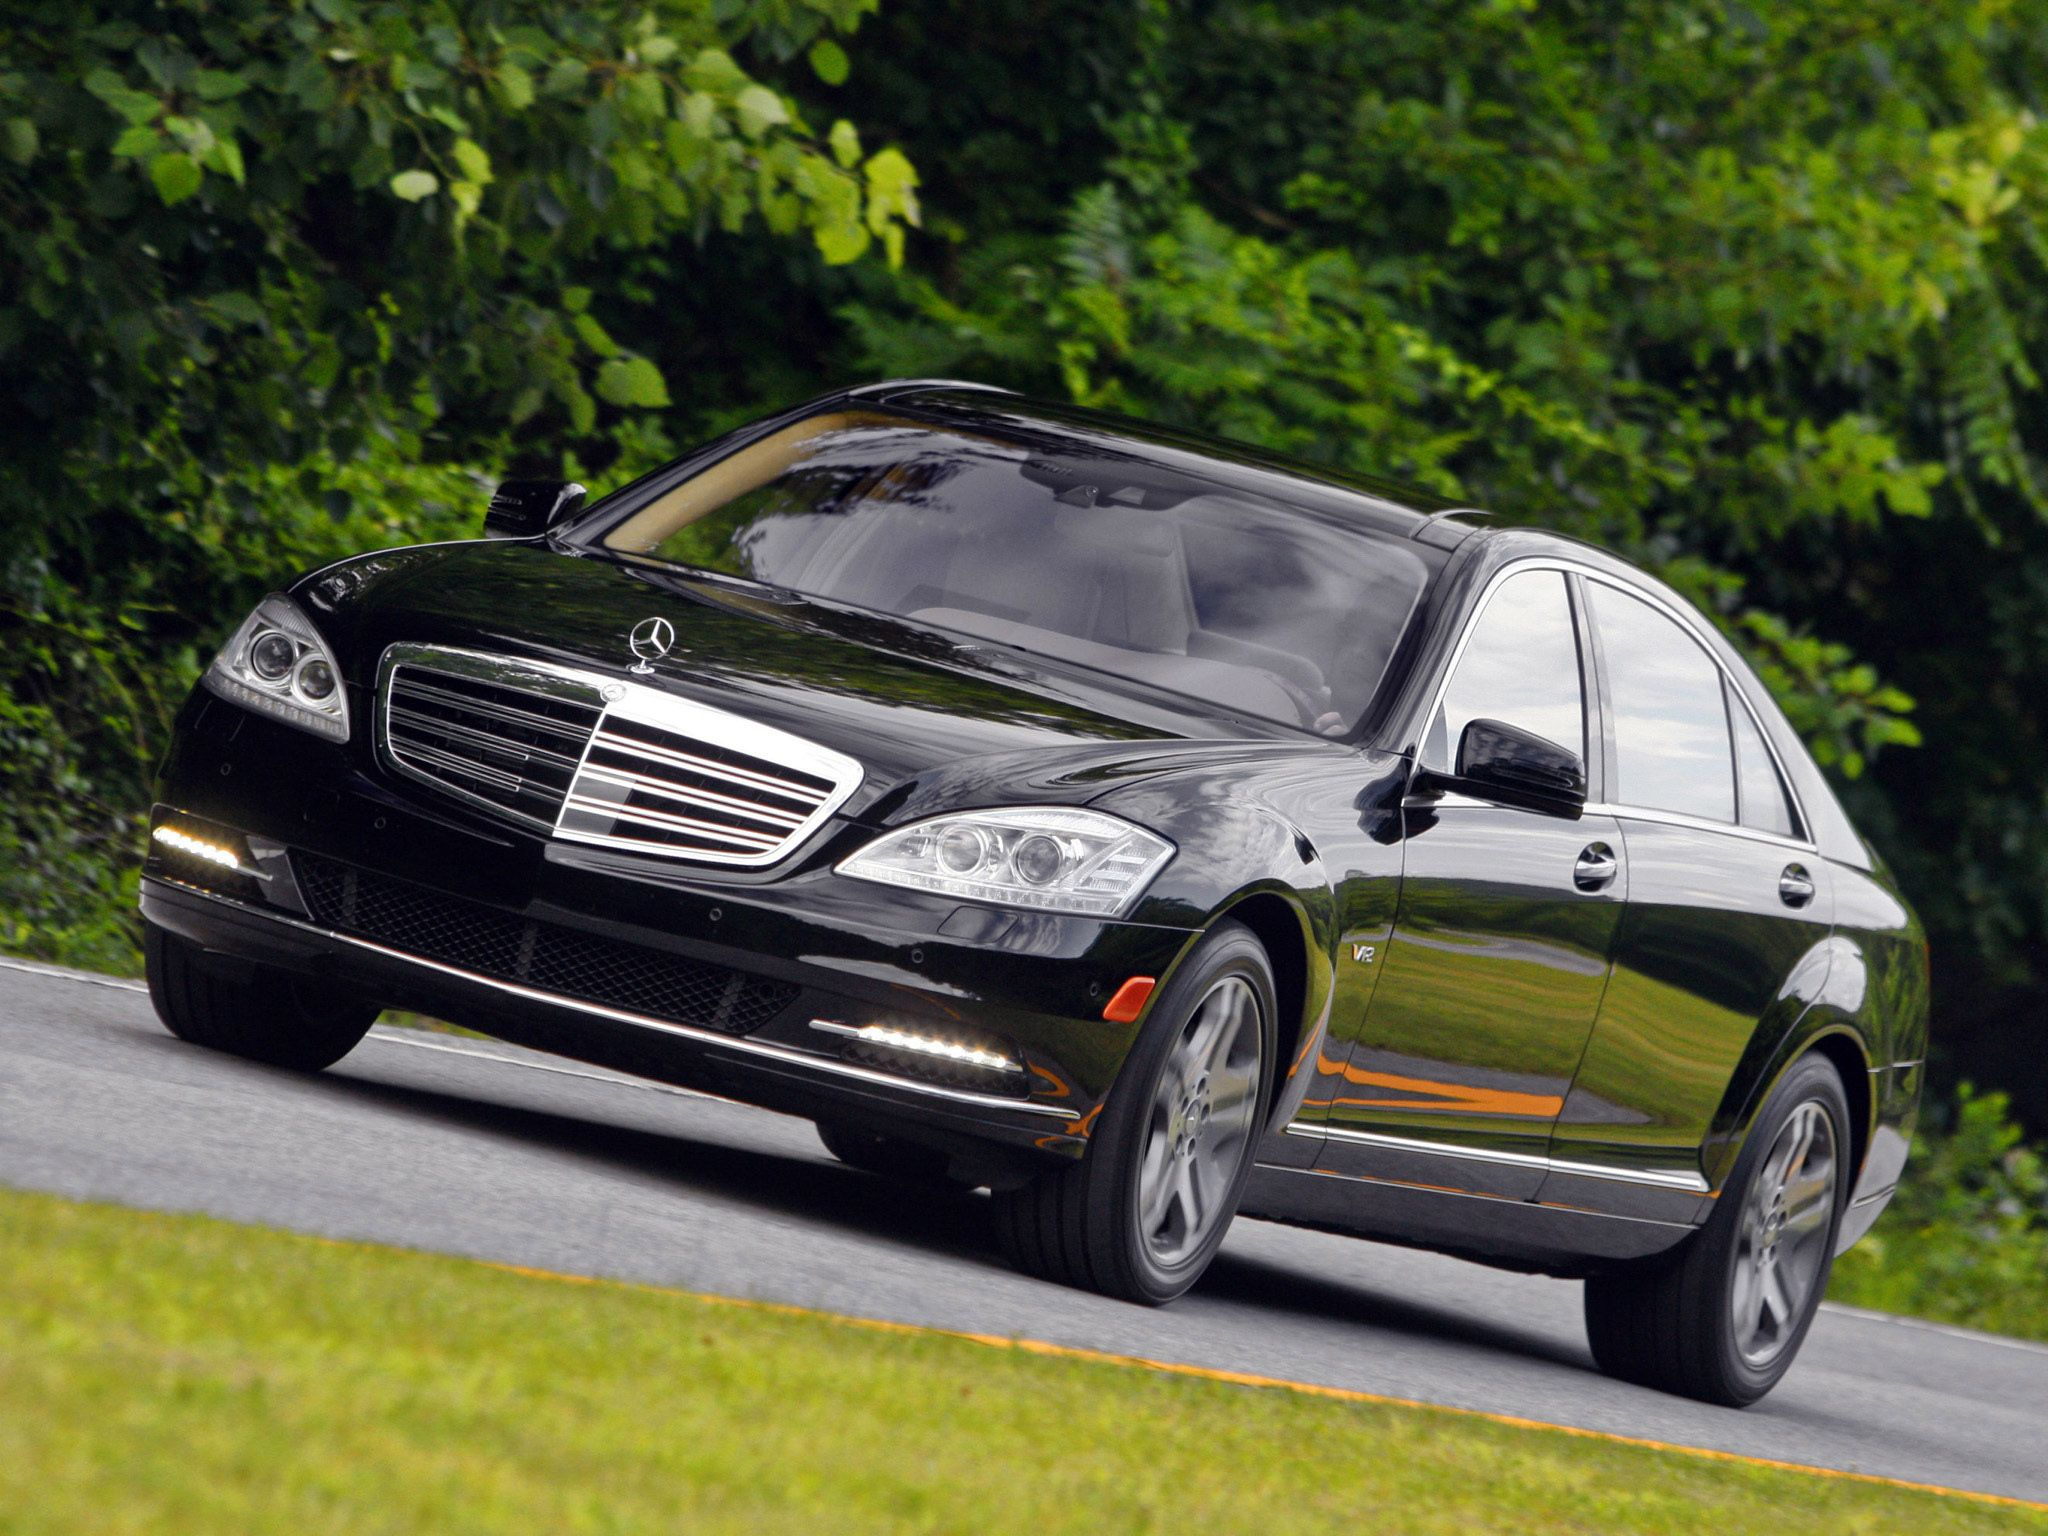 Mercedes W221 S Class